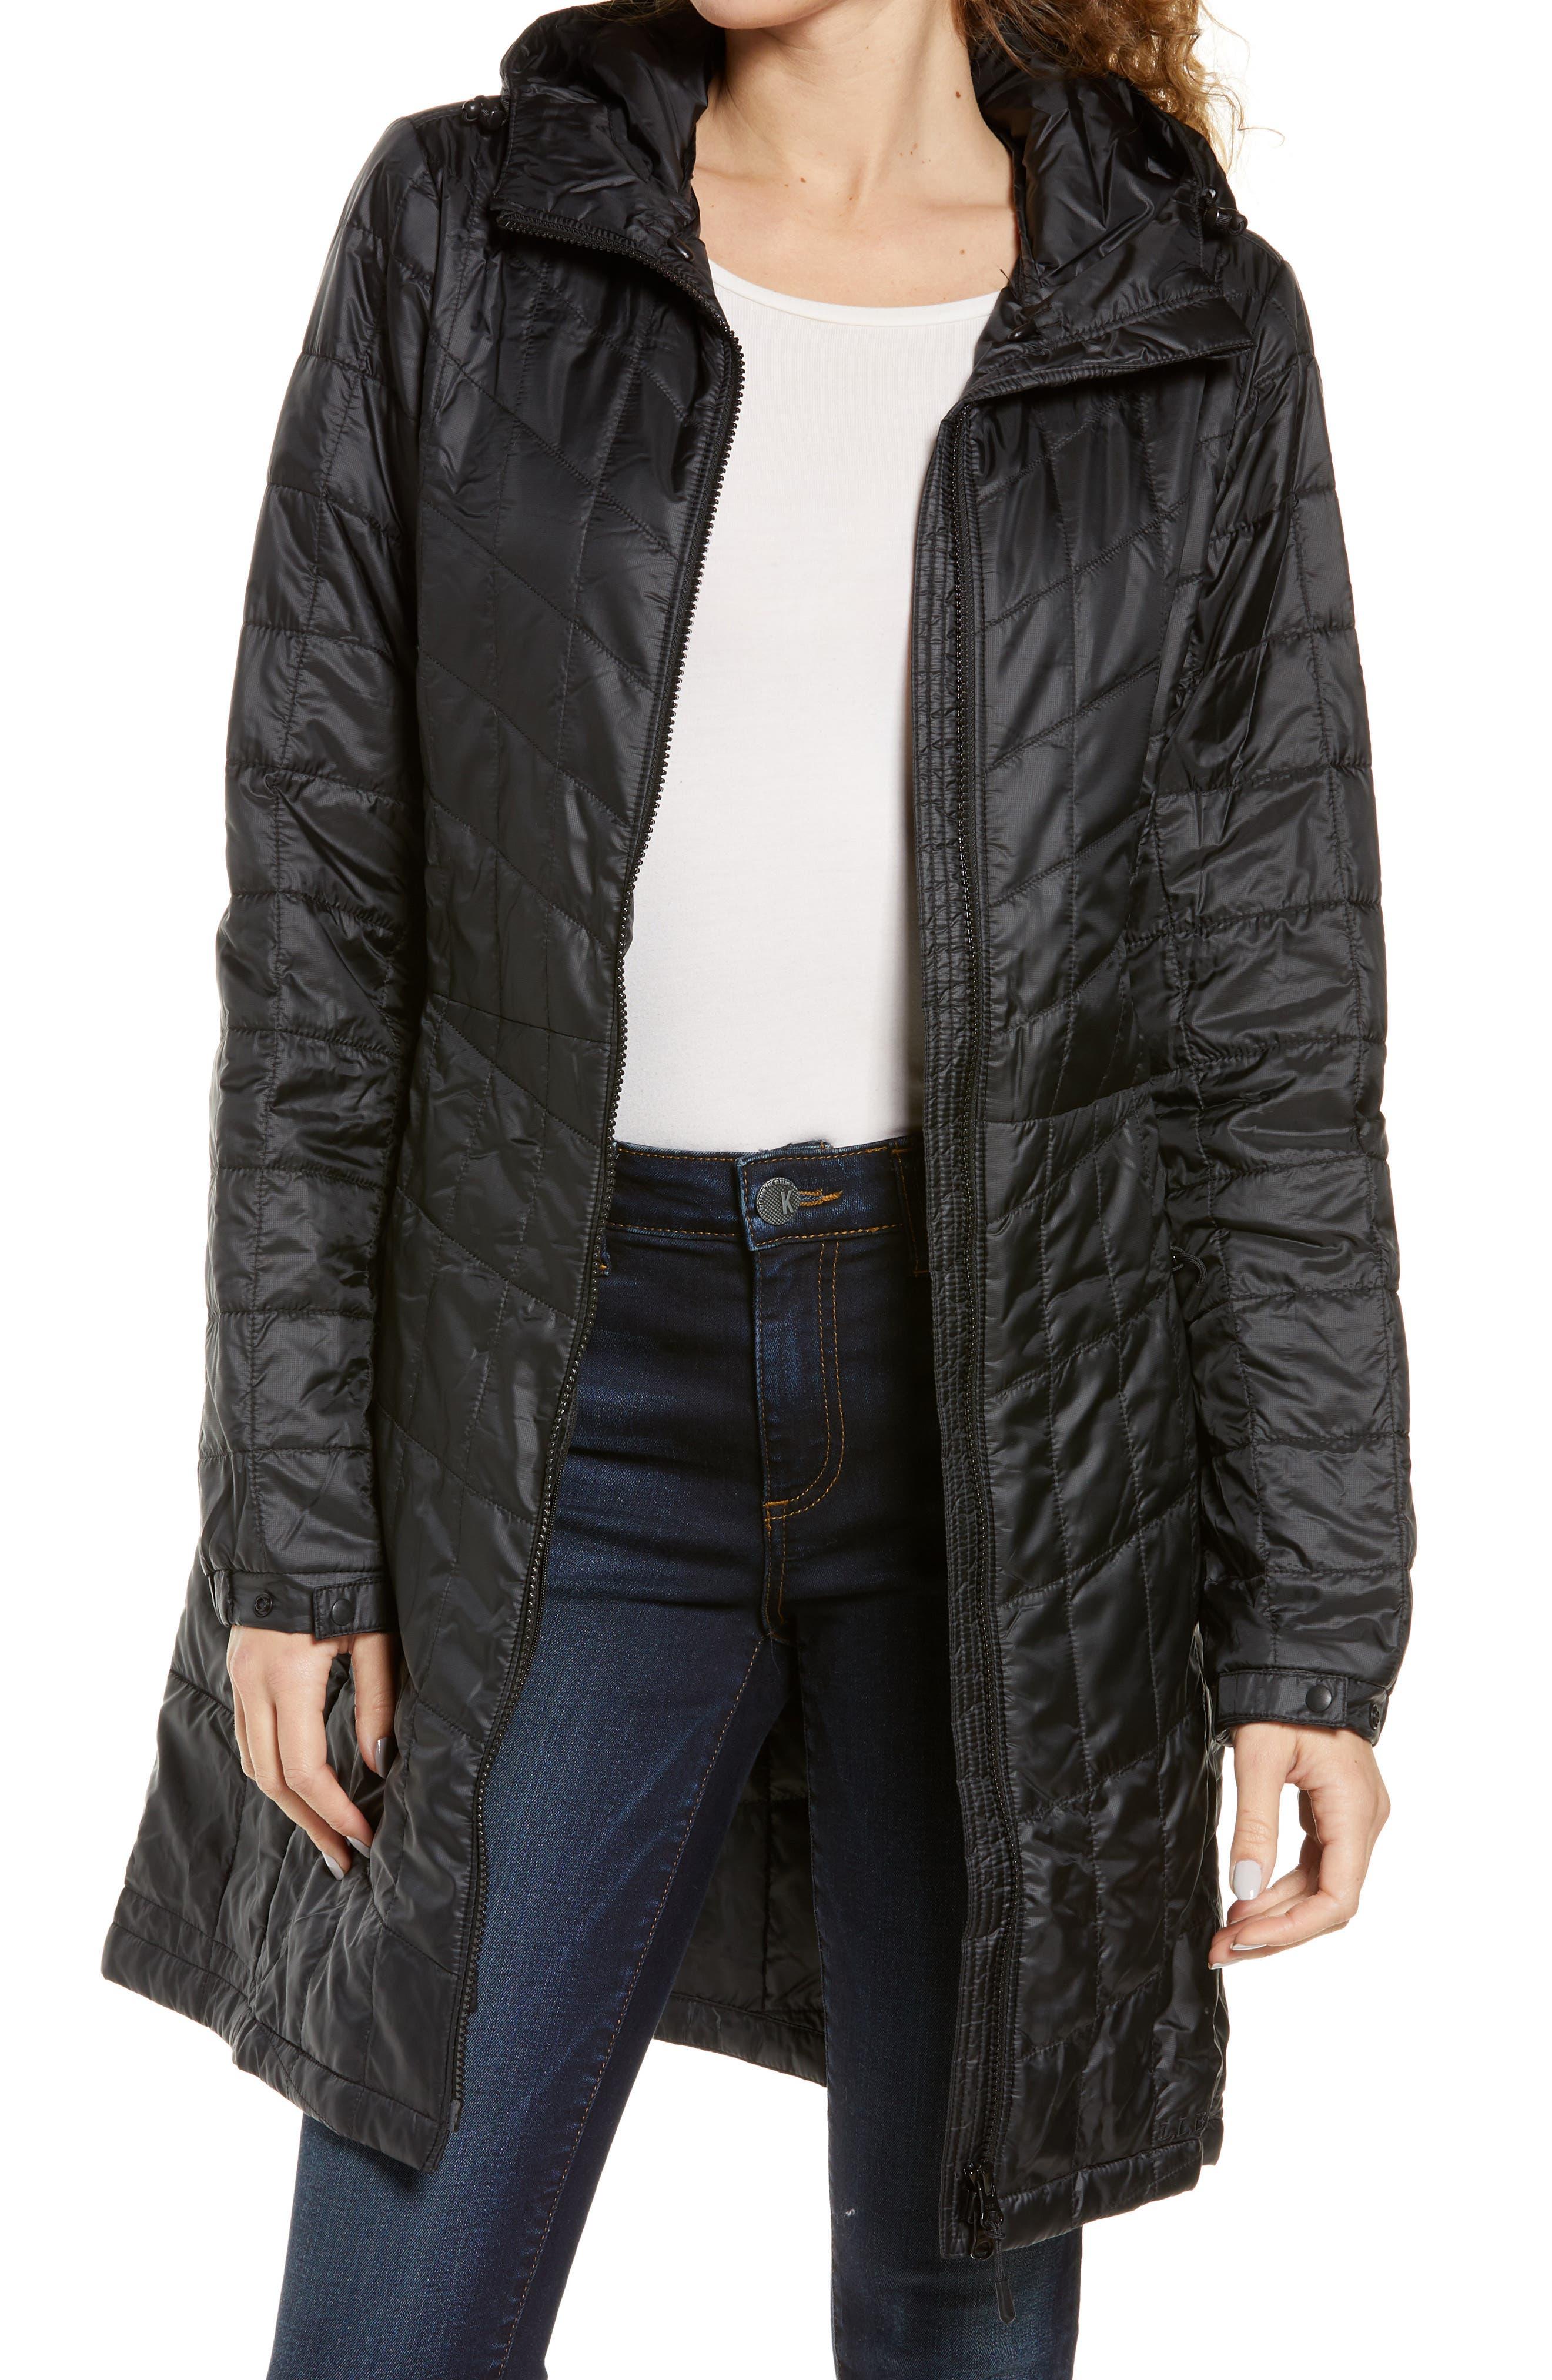 Women's L.l. Bean Packaway Quilted Water Resistant Hooded Coat